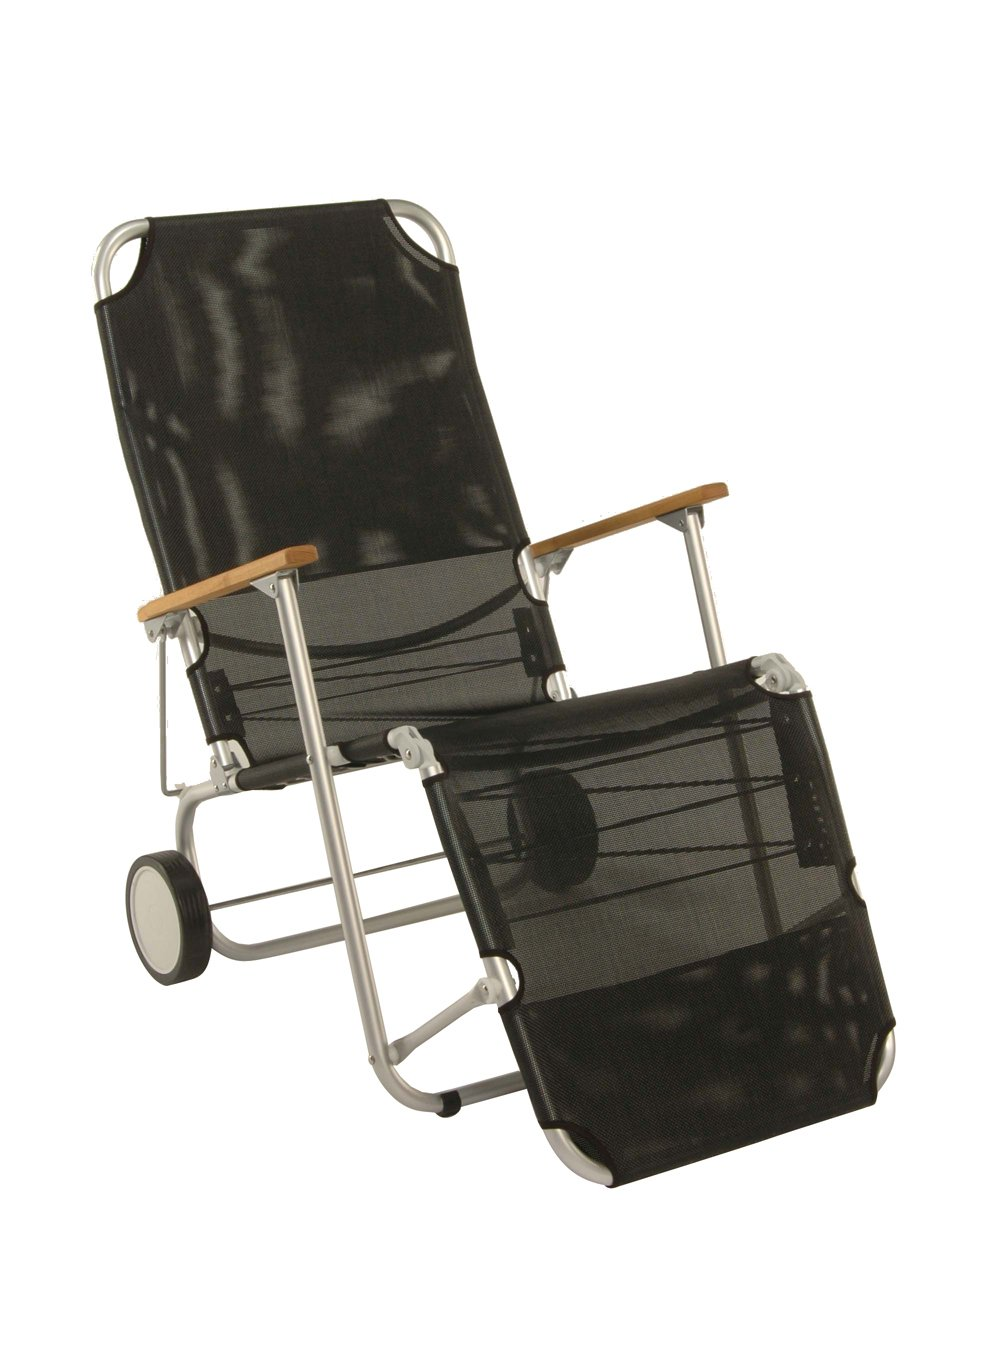 Stern 440701 Beach Carry, Gestell Aluminium mit Teakarmlehnen, Bezug Textilen schwarz günstig